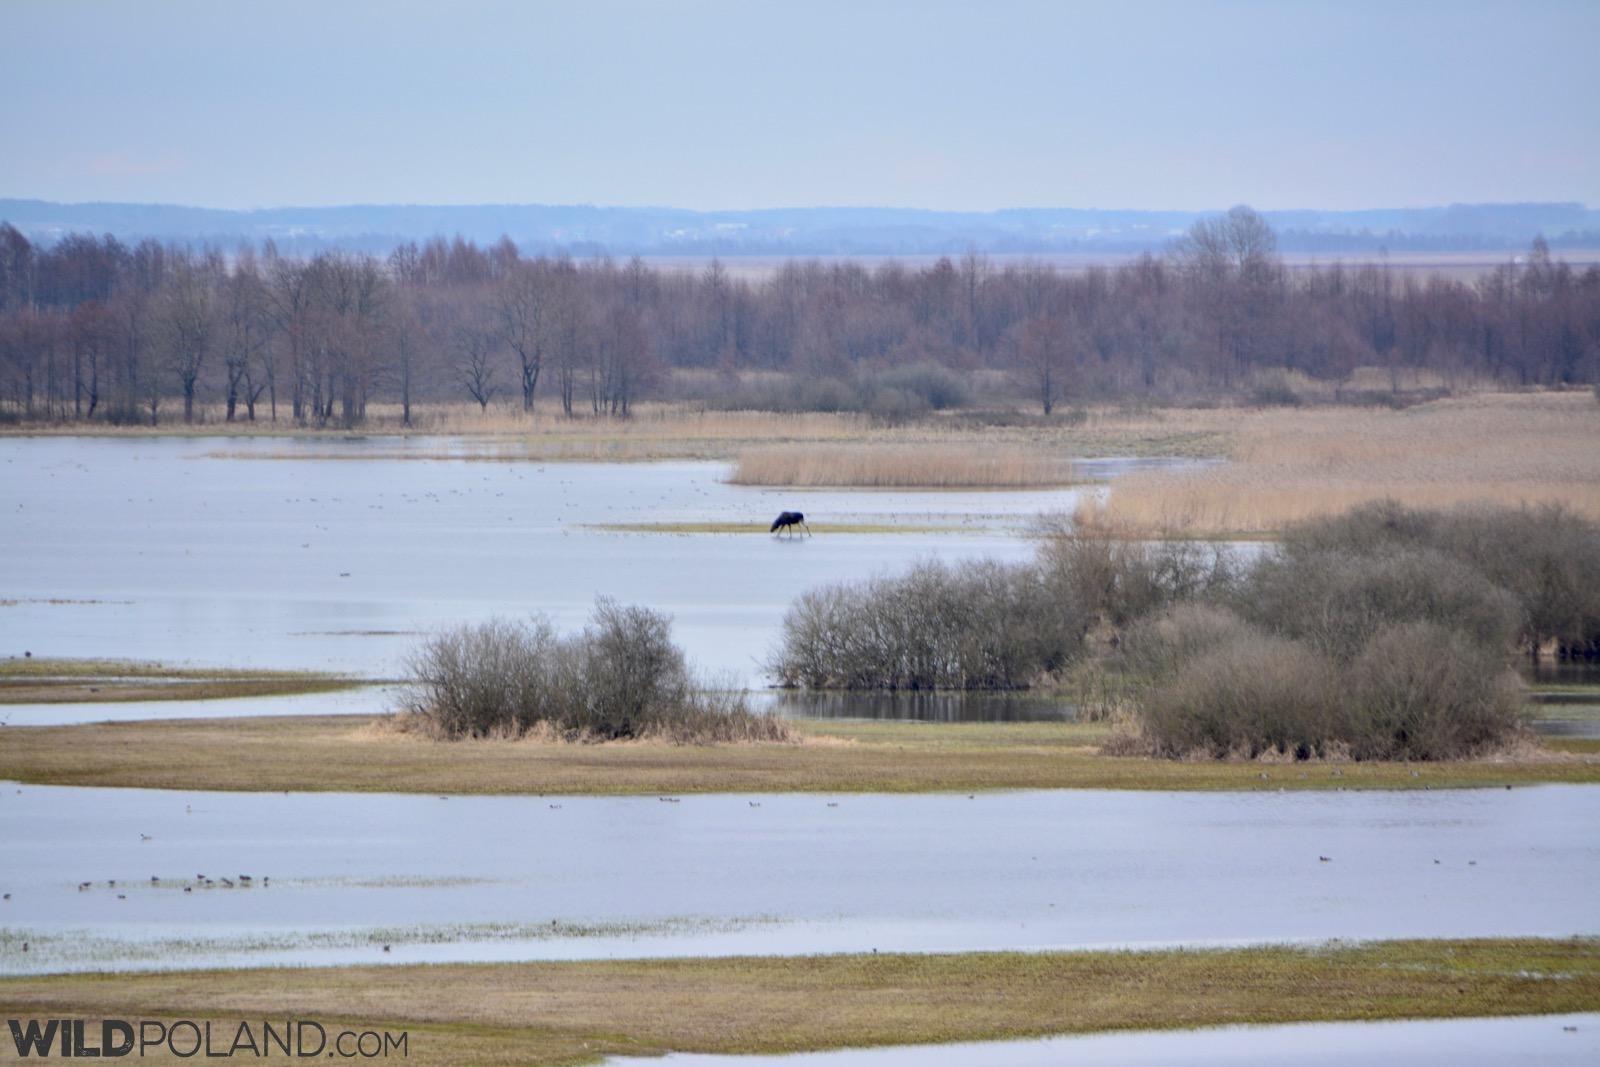 Elk (Moose) at the Biebrza Marshes, photo by Michał Skierczyński